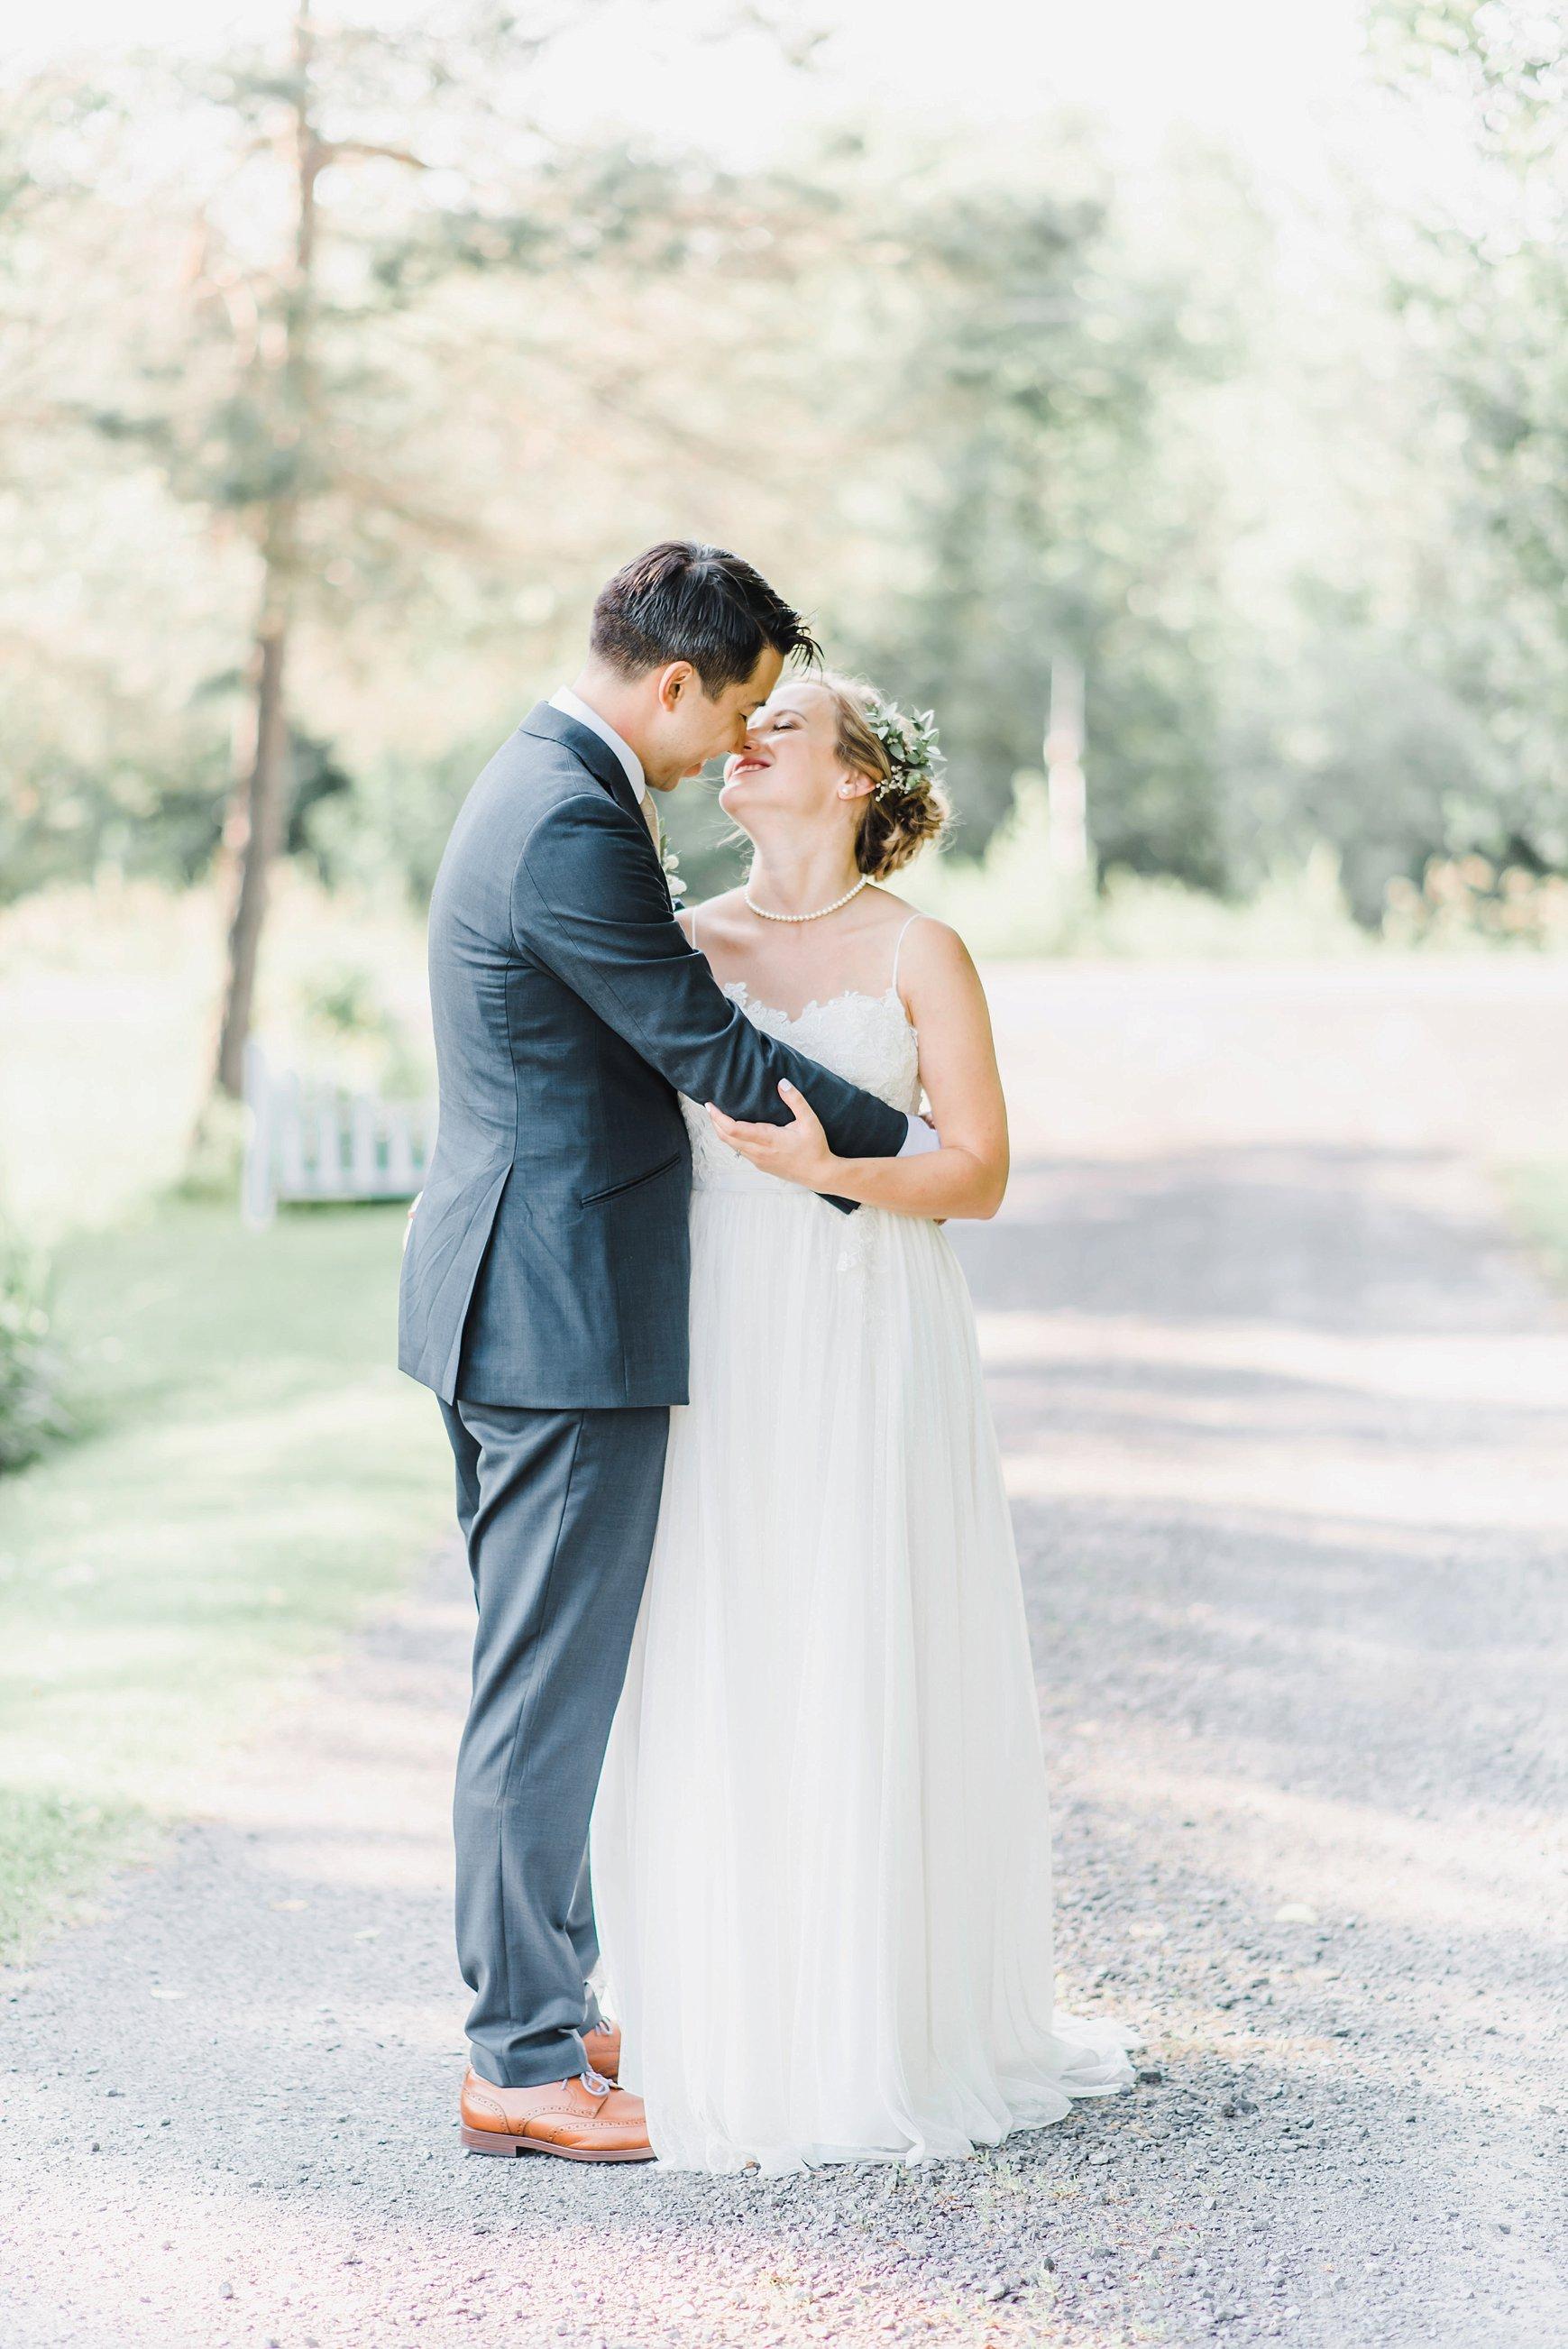 light airy indie fine art ottawa wedding photographer | Ali and Batoul Photography_0857.jpg